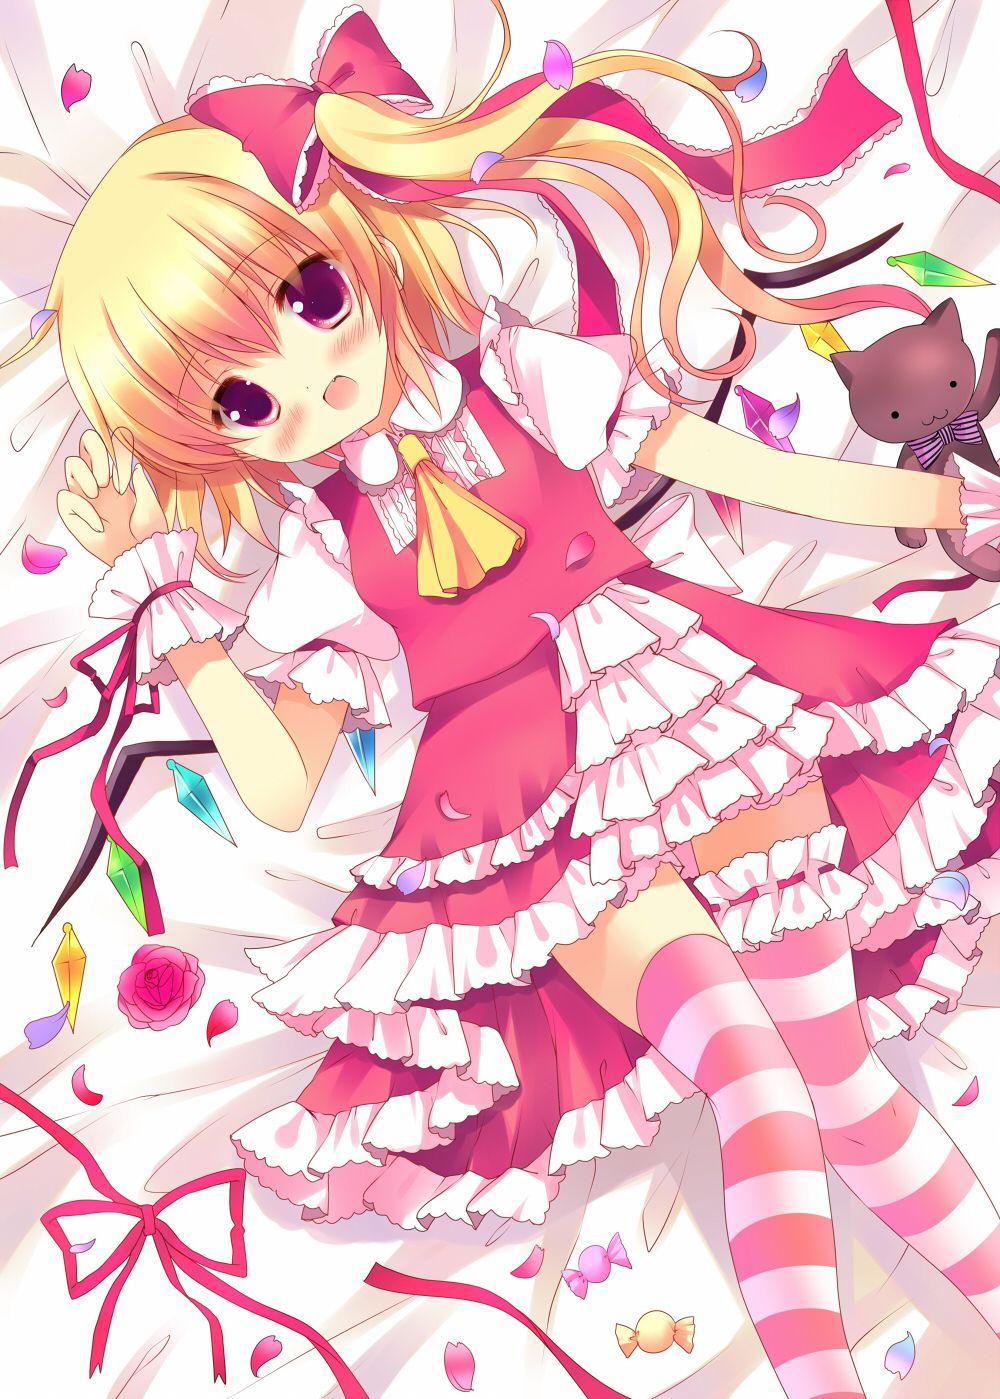 Touhou, Flandre Scarlet, animal, blush, candy, cat, lying